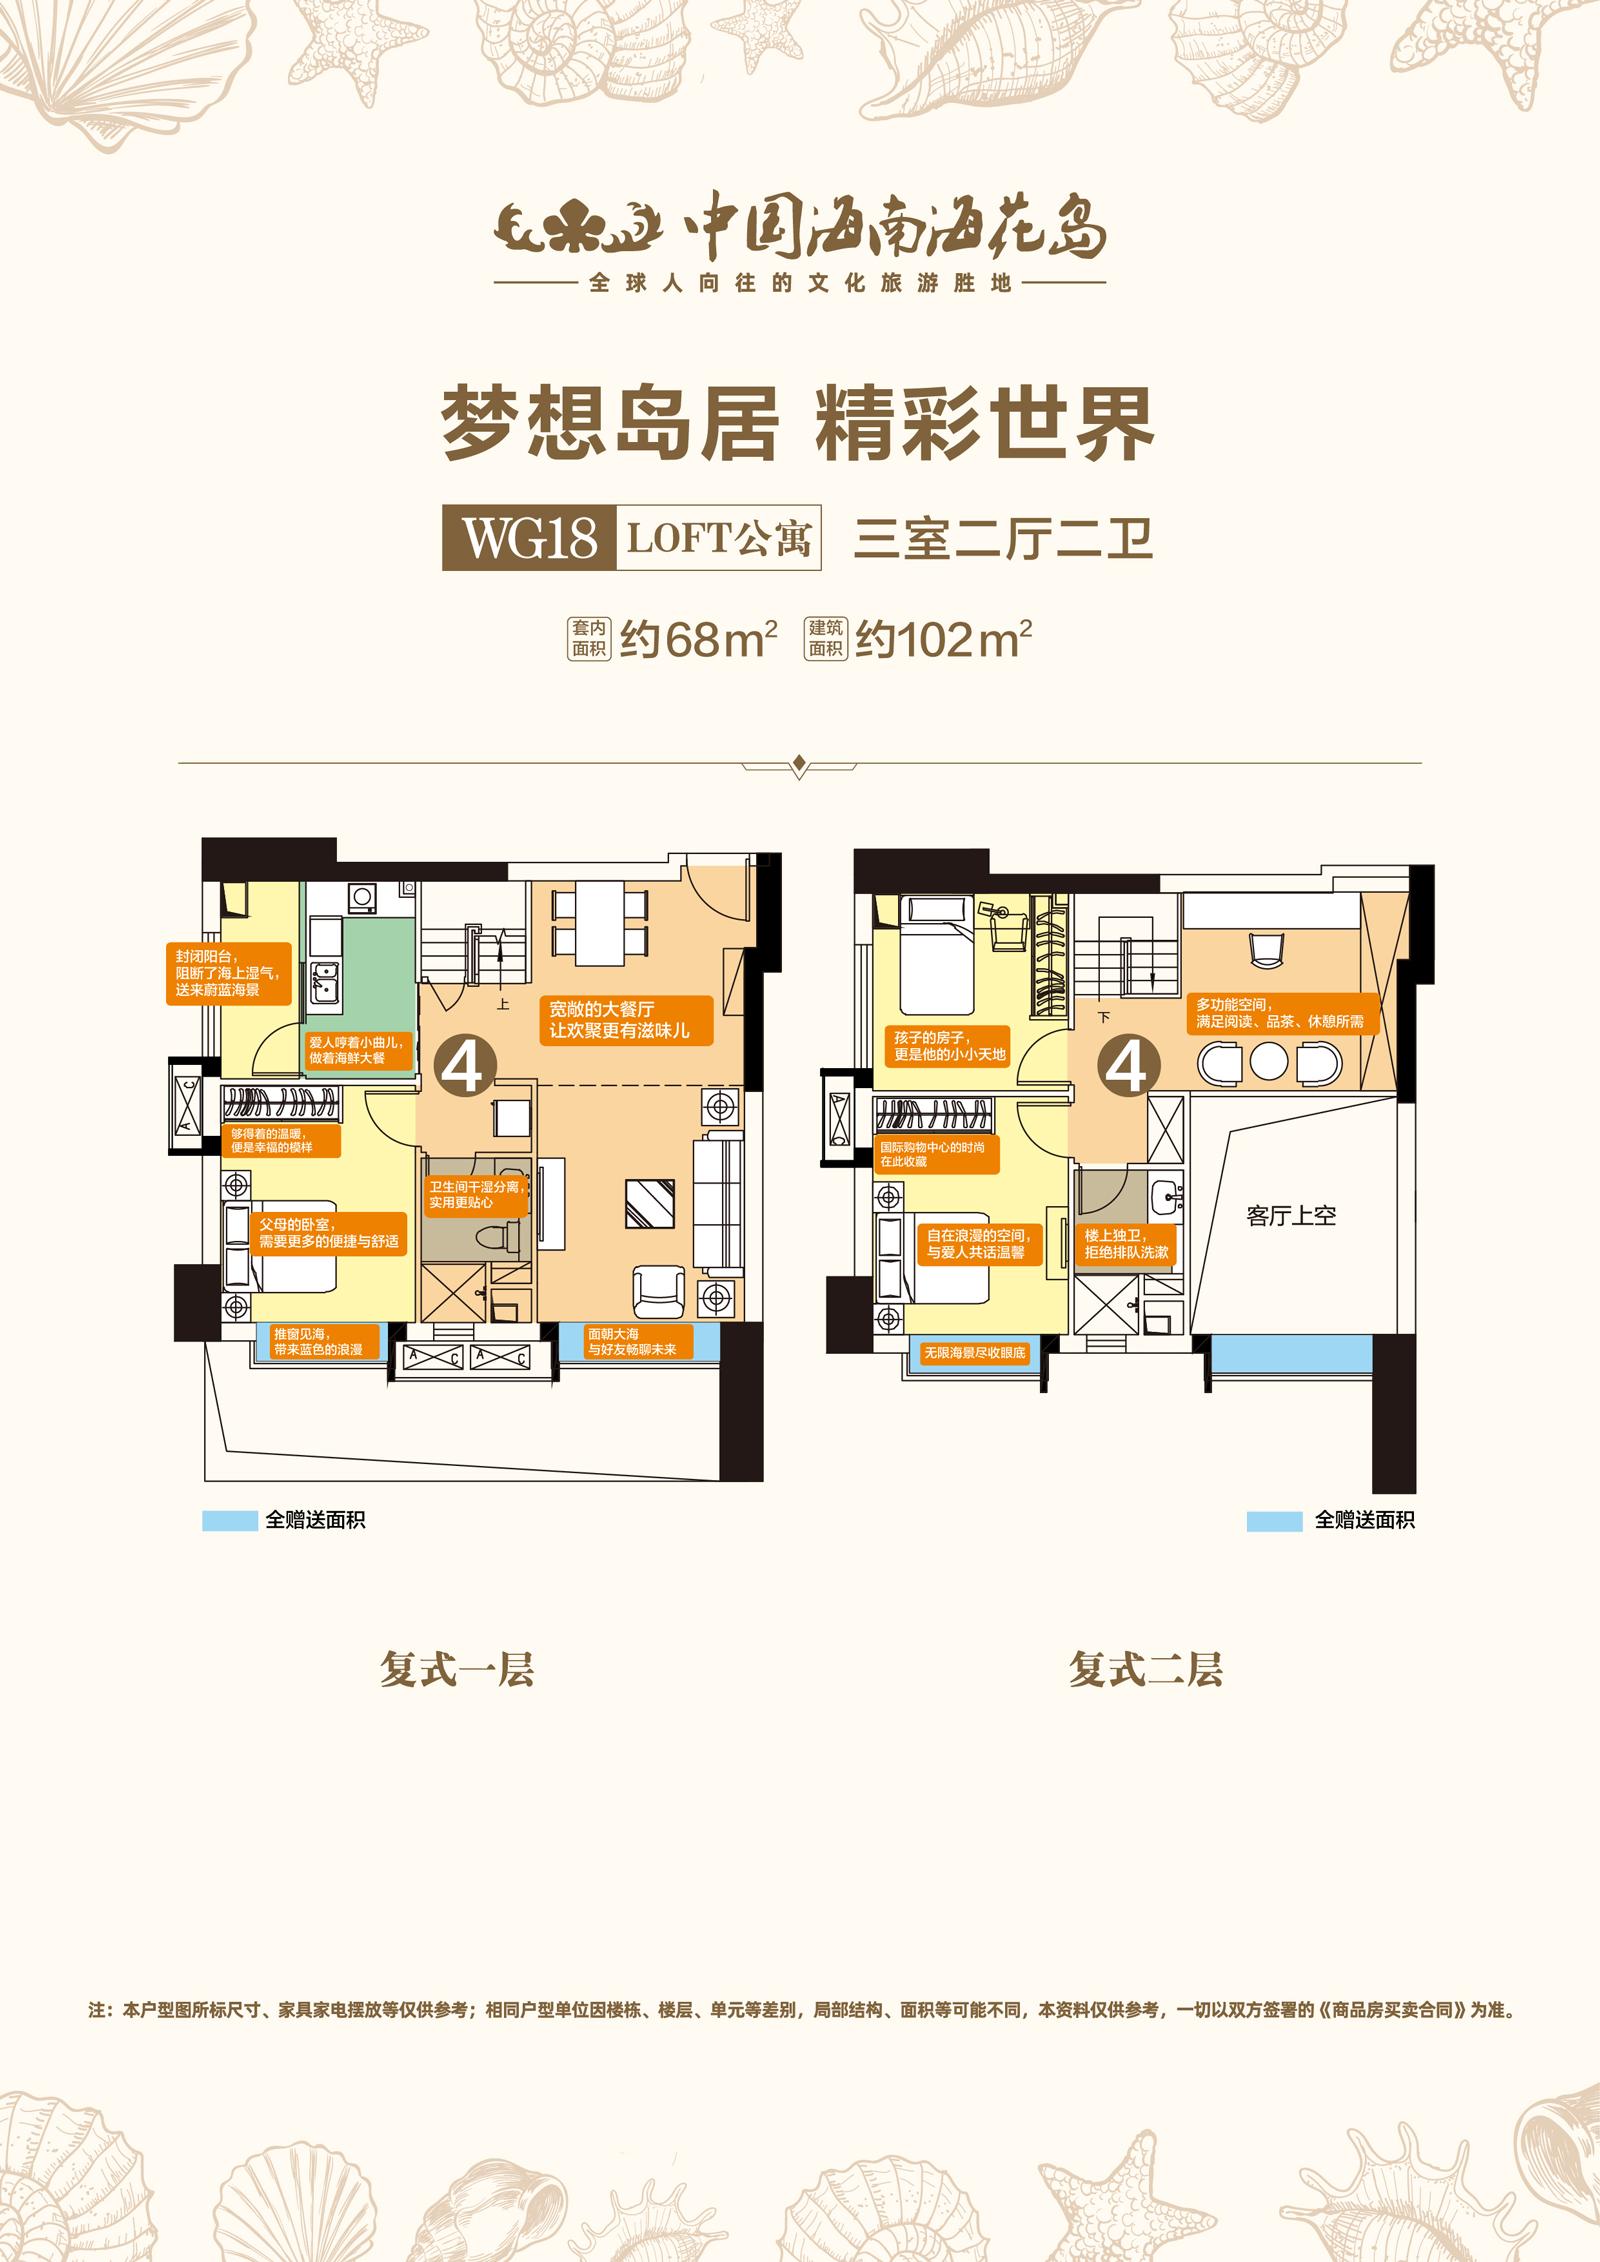 WG18LOFT公寓 3室2厅2卫 建面约68㎡、102㎡